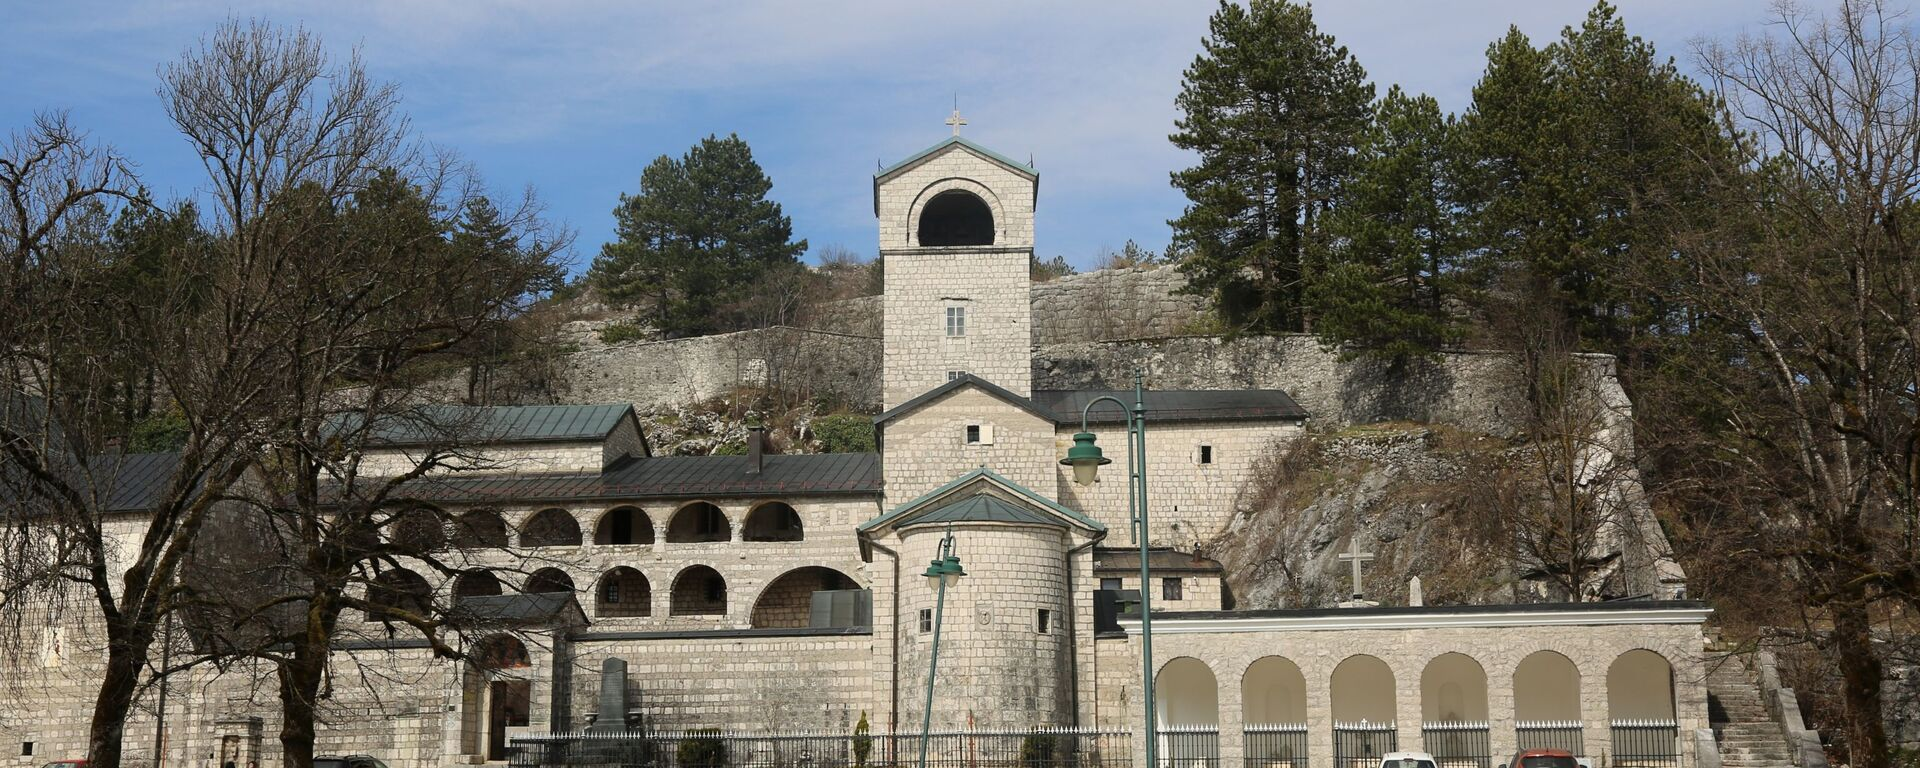 Цетињски манастир - Sputnik Србија, 1920, 24.08.2021